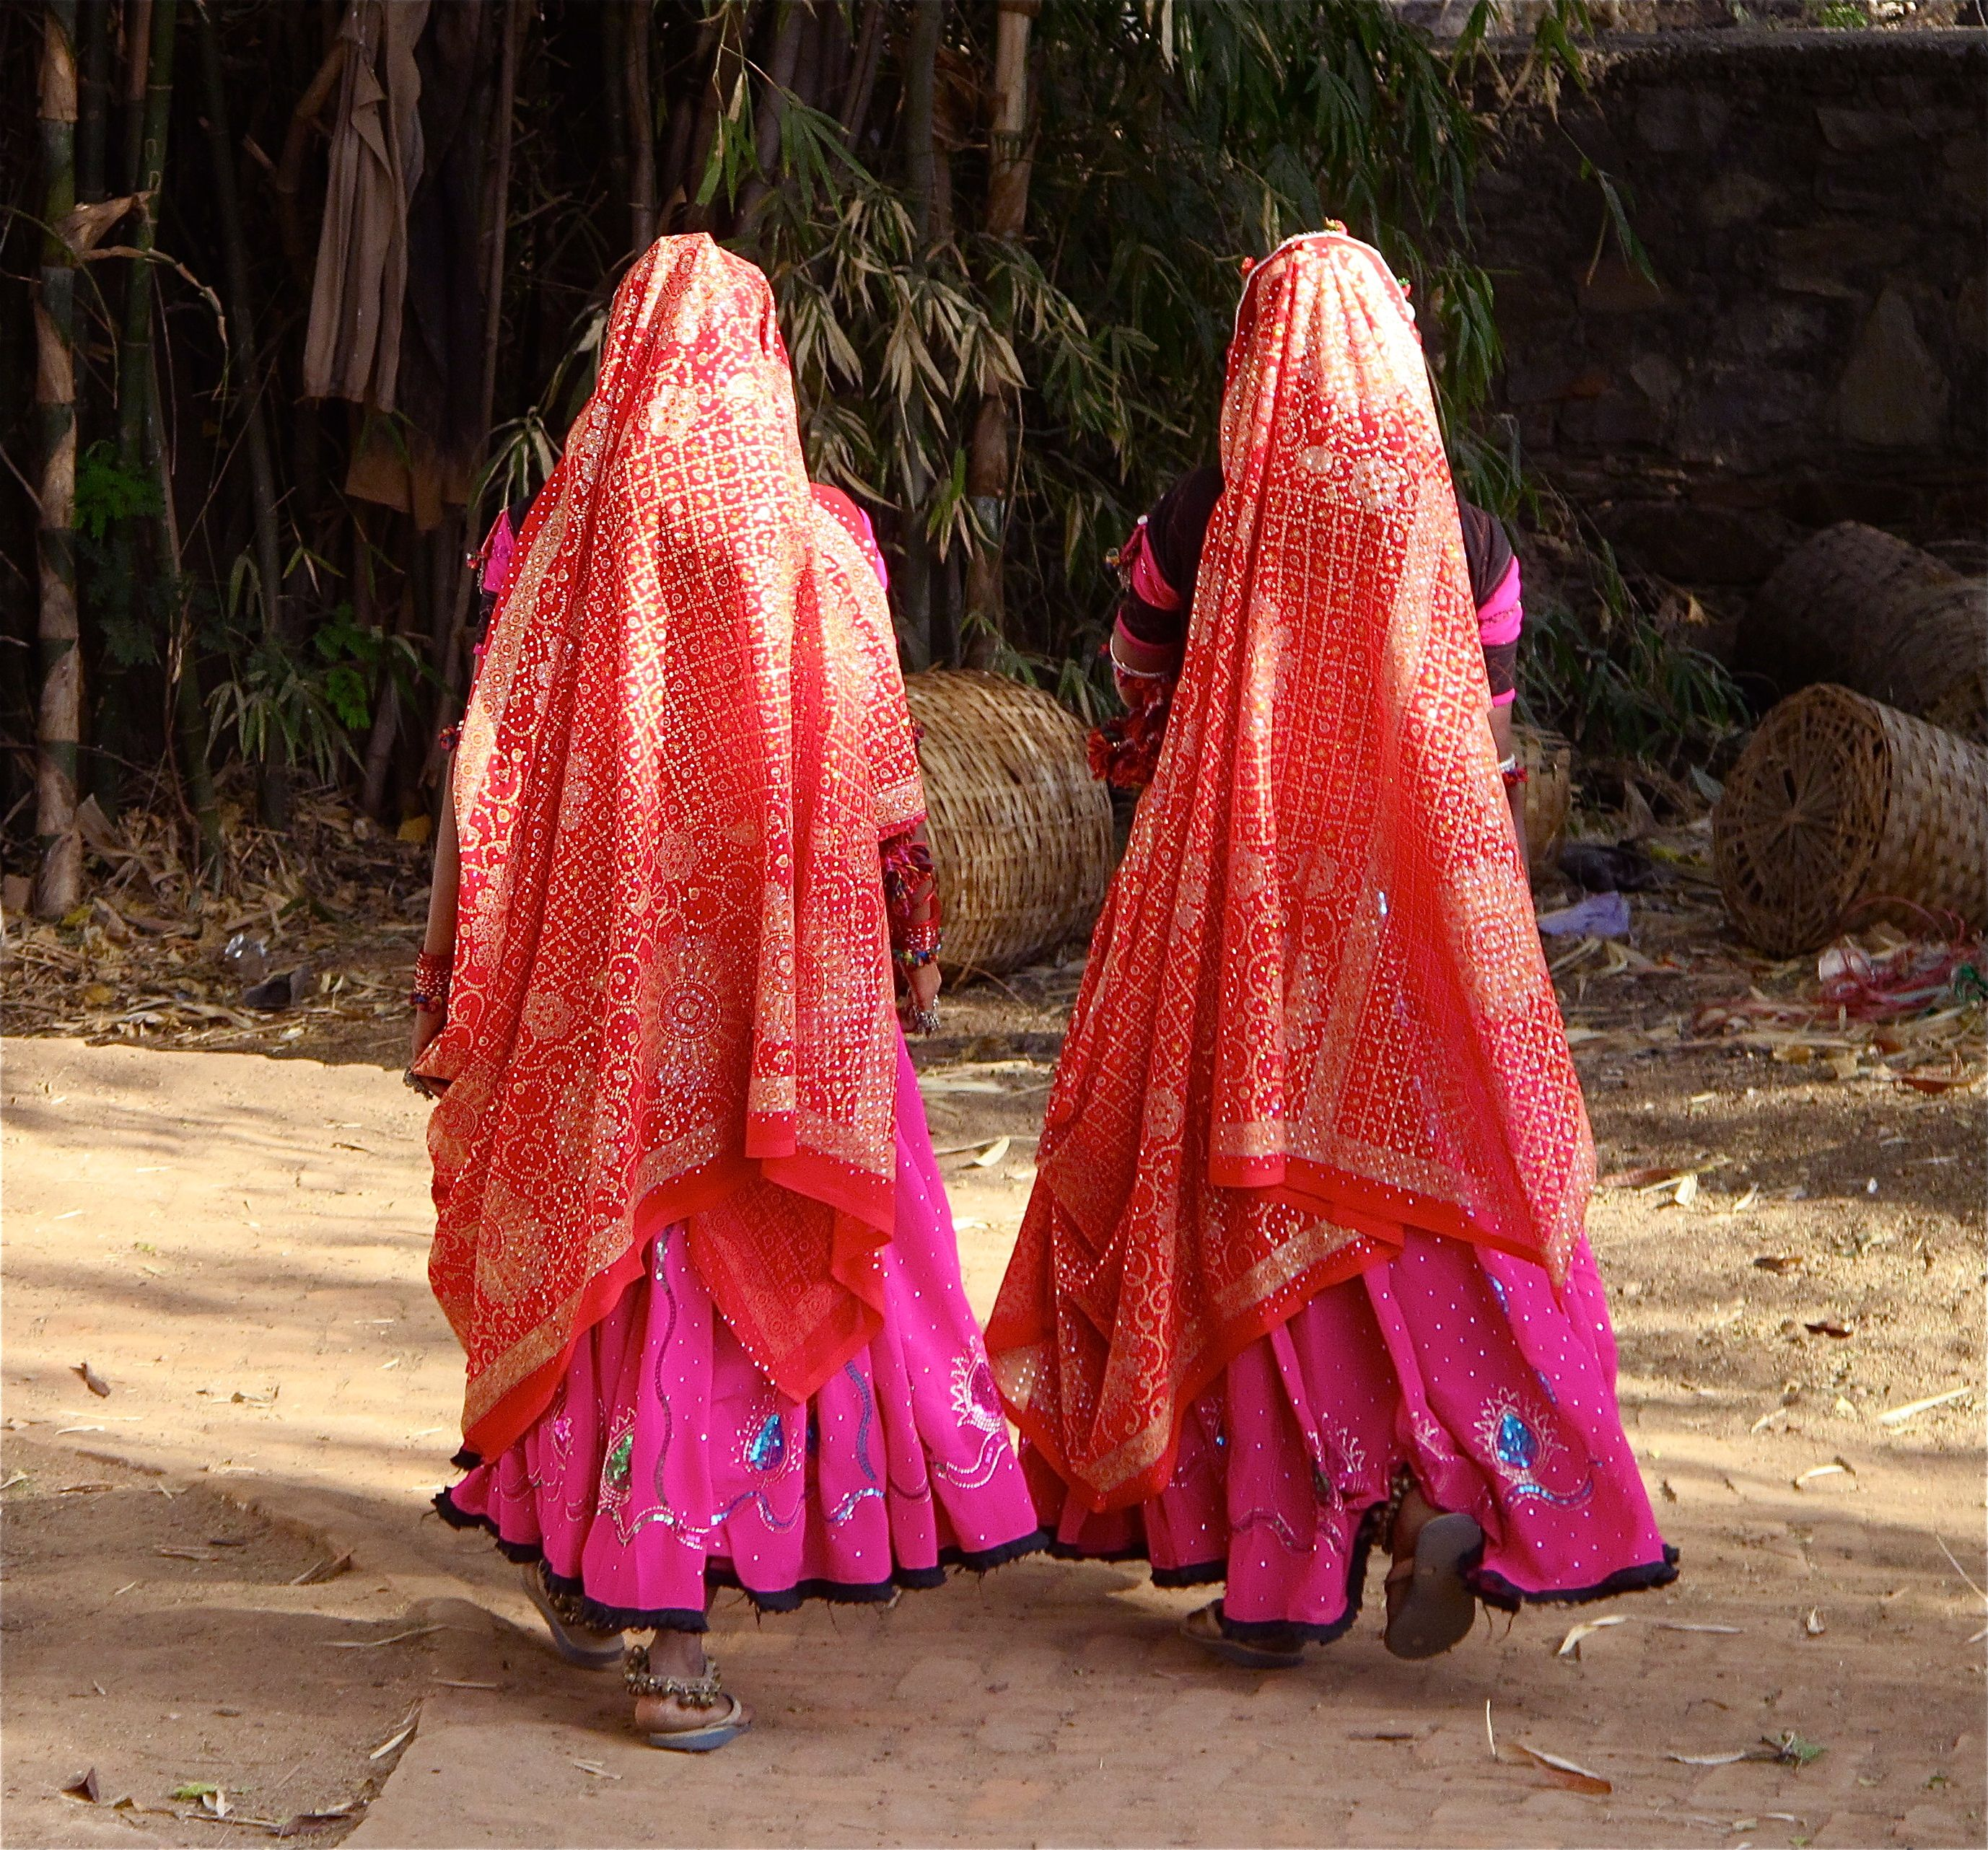 Udaipur, Rajasthan. Sylviane A. Diouf